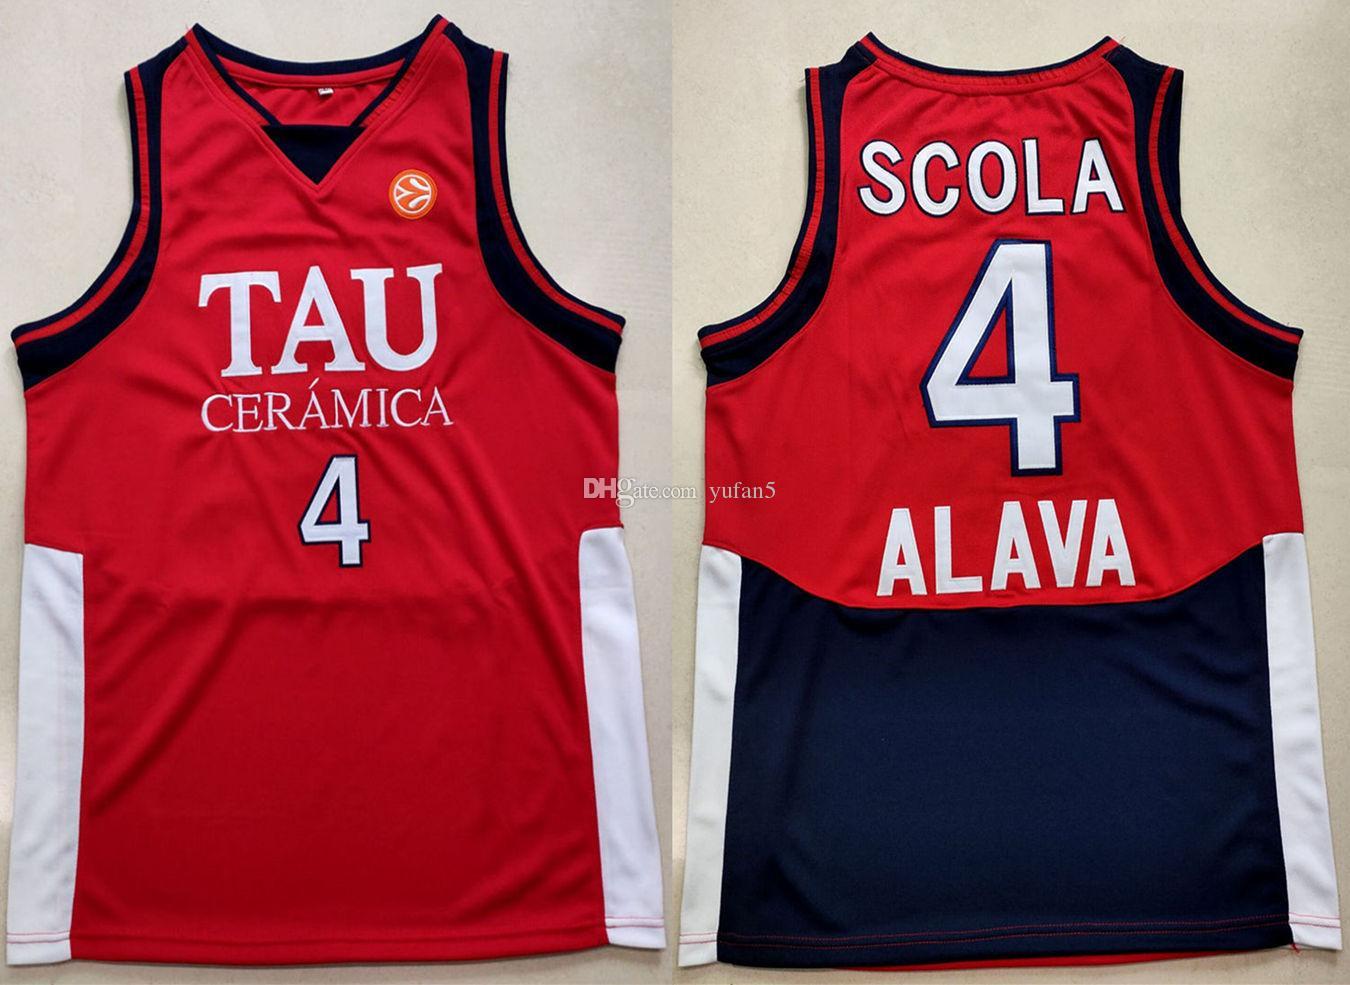 Luis Scola # 4 Tau Ceramica Retro Maglie da basket Cucite su ordinazione Qualsiasi numero di nome